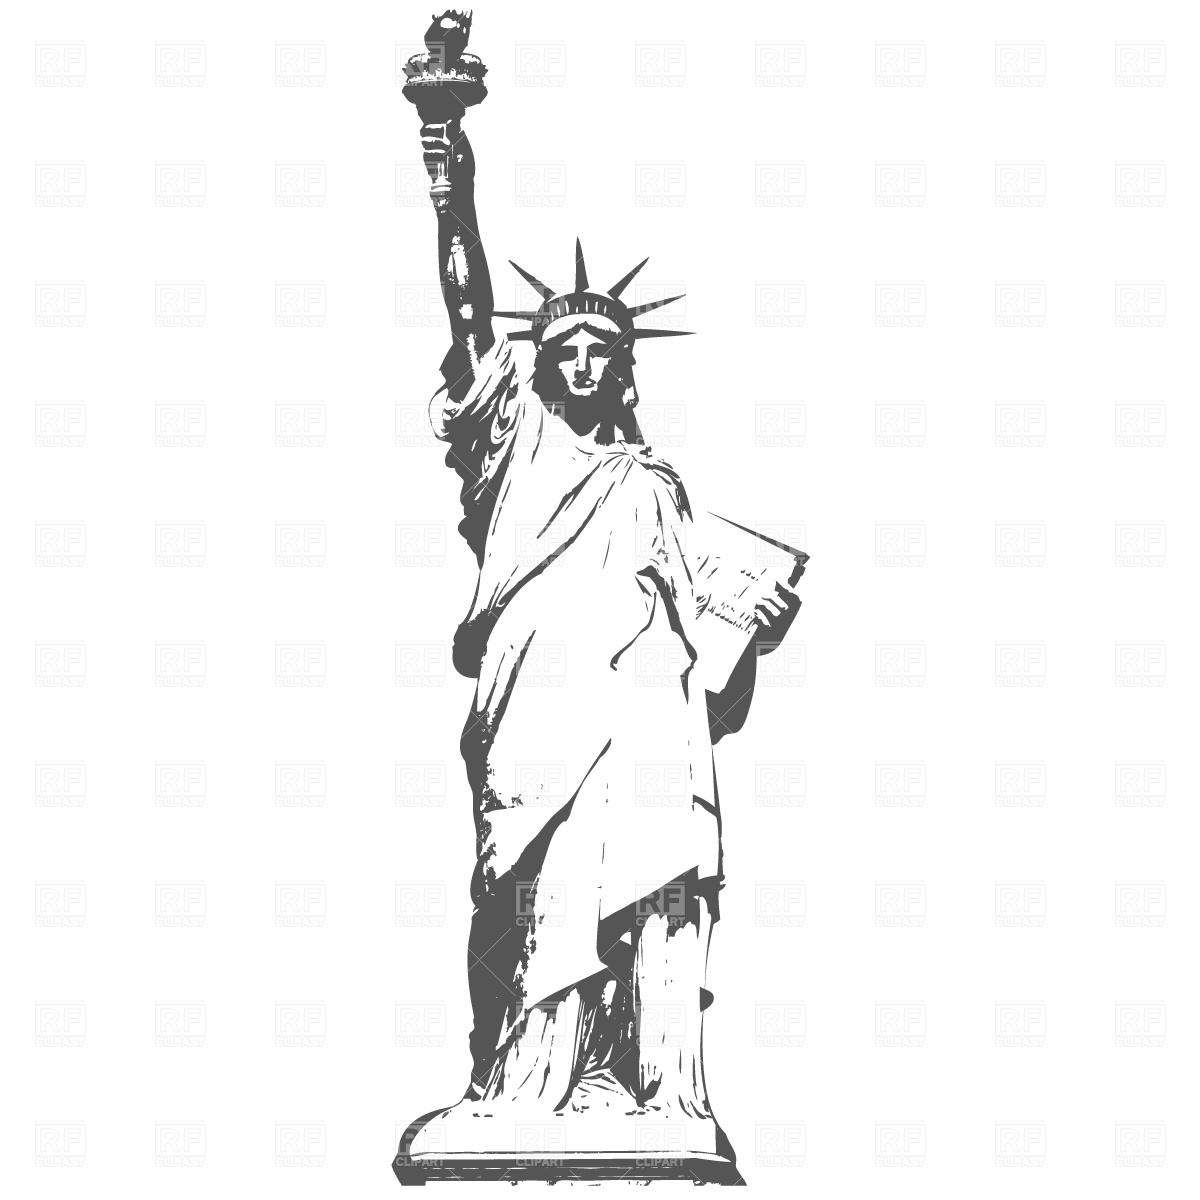 Statue Of Liberty Landmarks-Statue of Liberty Landmarks-16